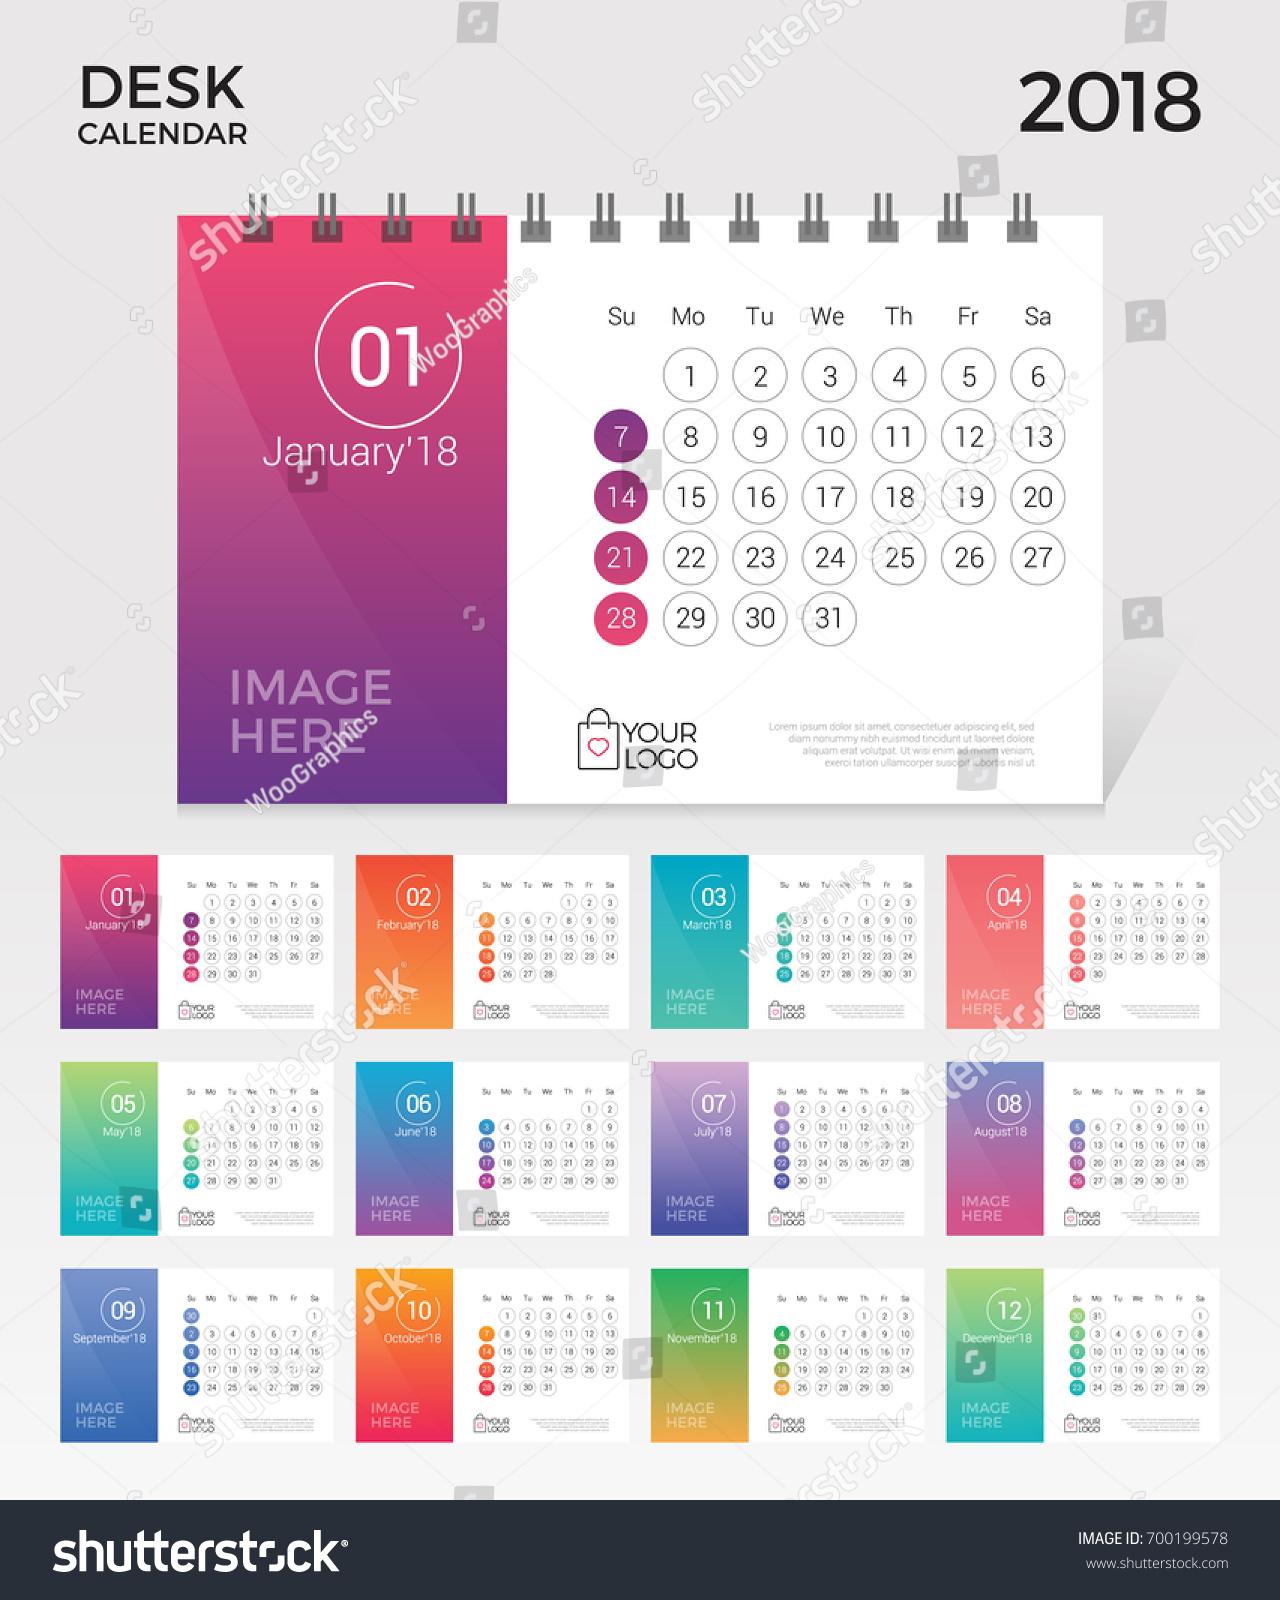 Elegant Desk Calendar Design : Desk calendar simple minimal elegant 스톡 벡터